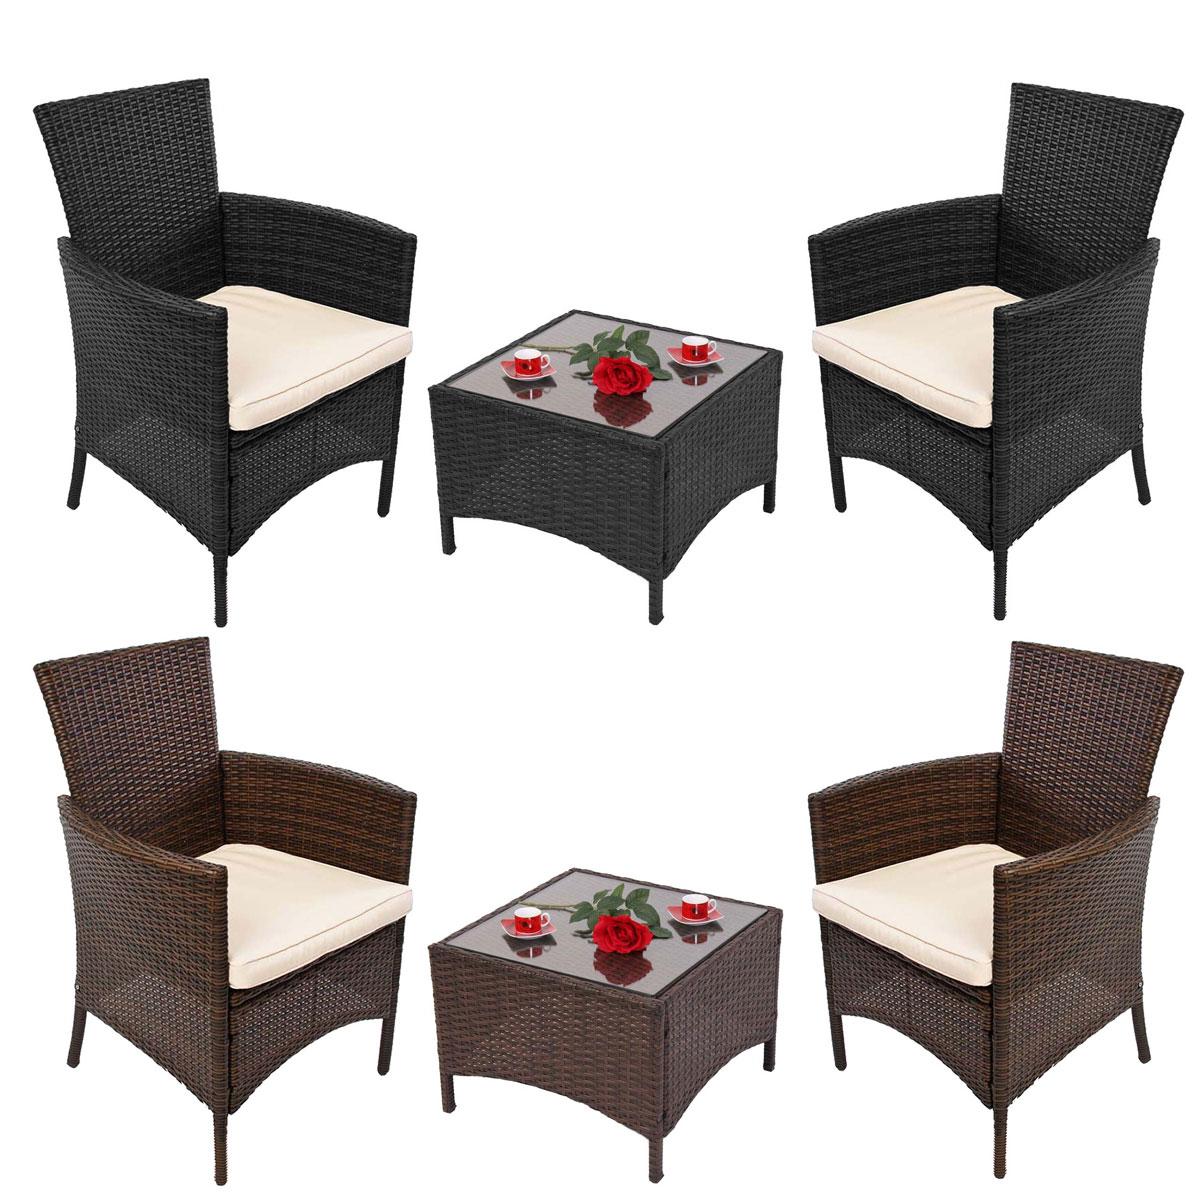 Garten-Garnitur Sitzgruppe RomV, Poly-Rattan, Tisch eckig + 2x Sessel ~ Variantenangebot